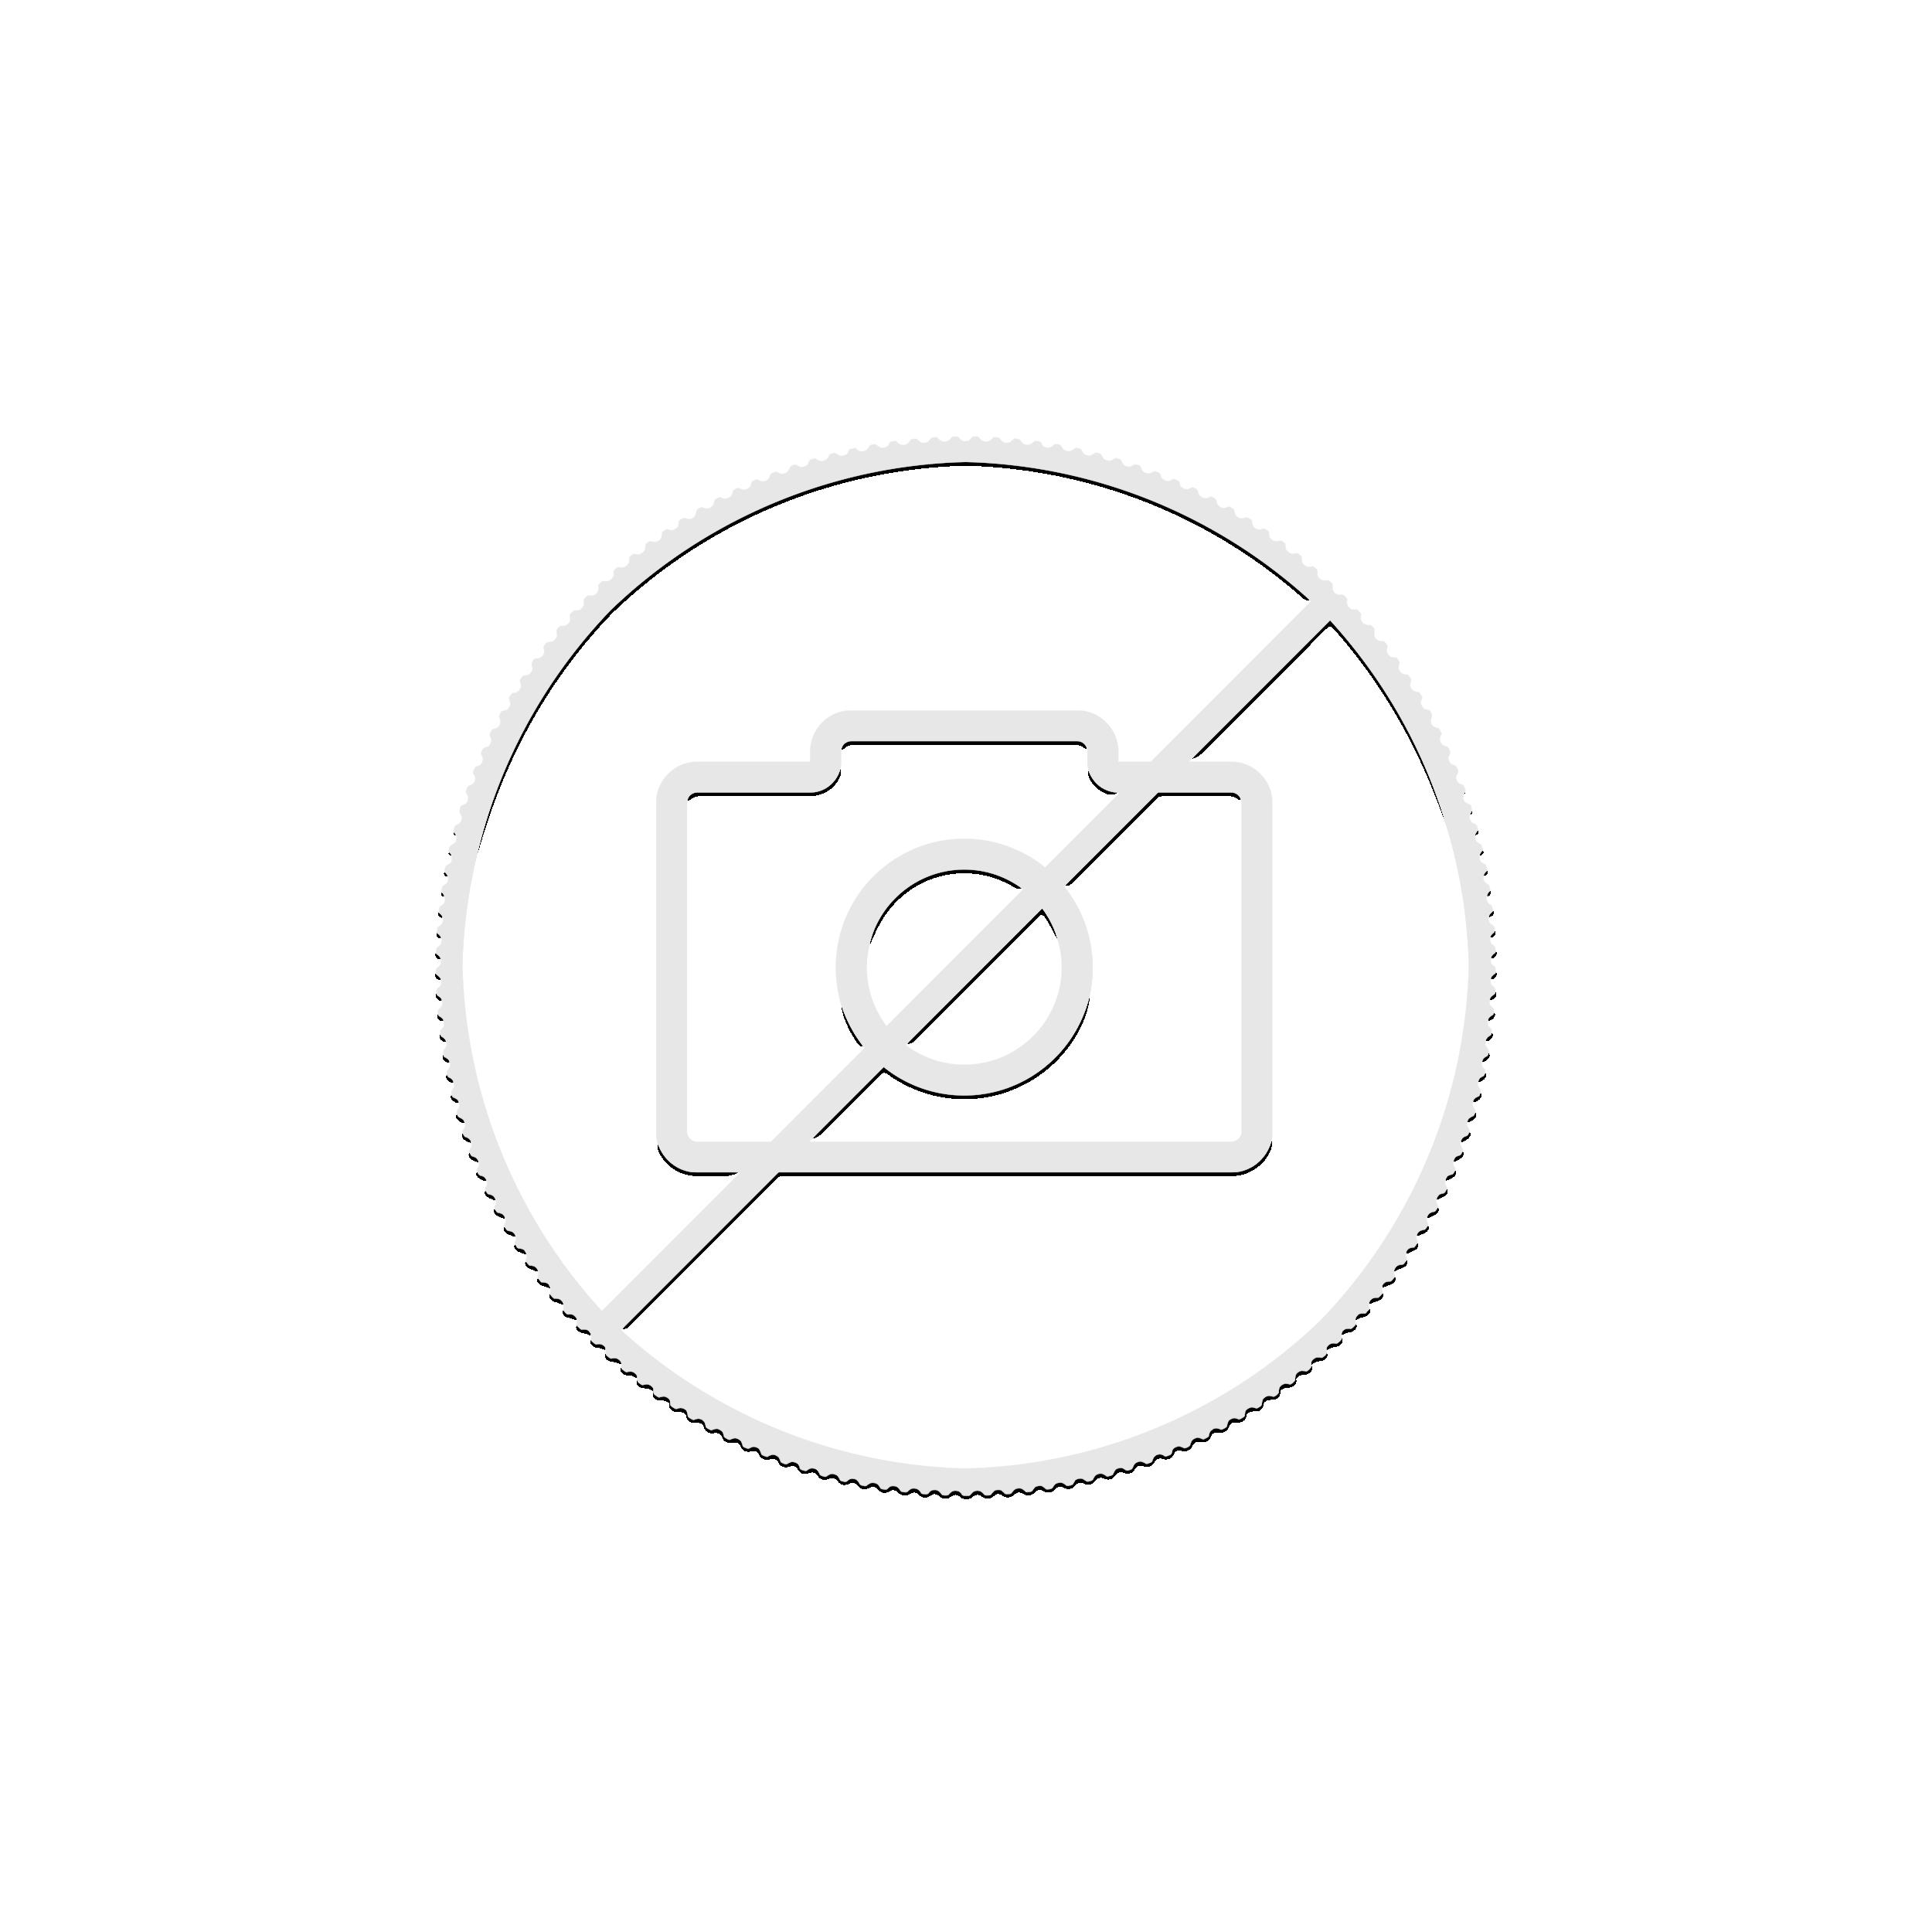 3 troy ounce zilveren munt Mystic Wolf 2021 Proof